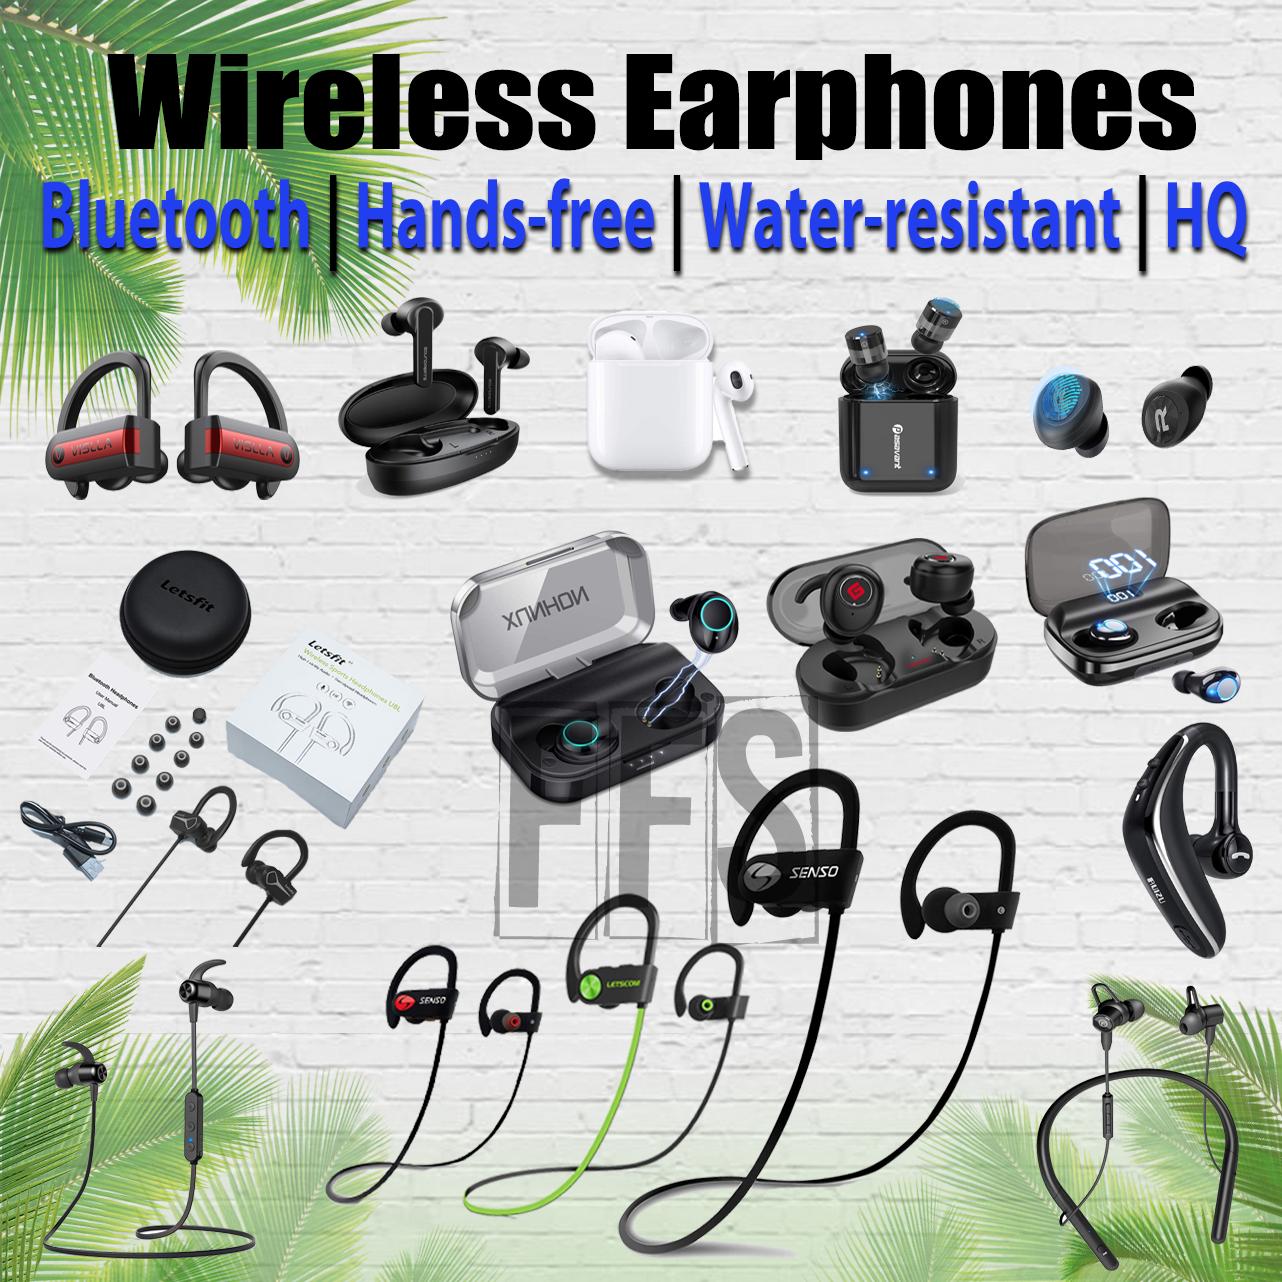 Wireless Earphones Earbud Bluetooth In-Ear lot Charger iPhon